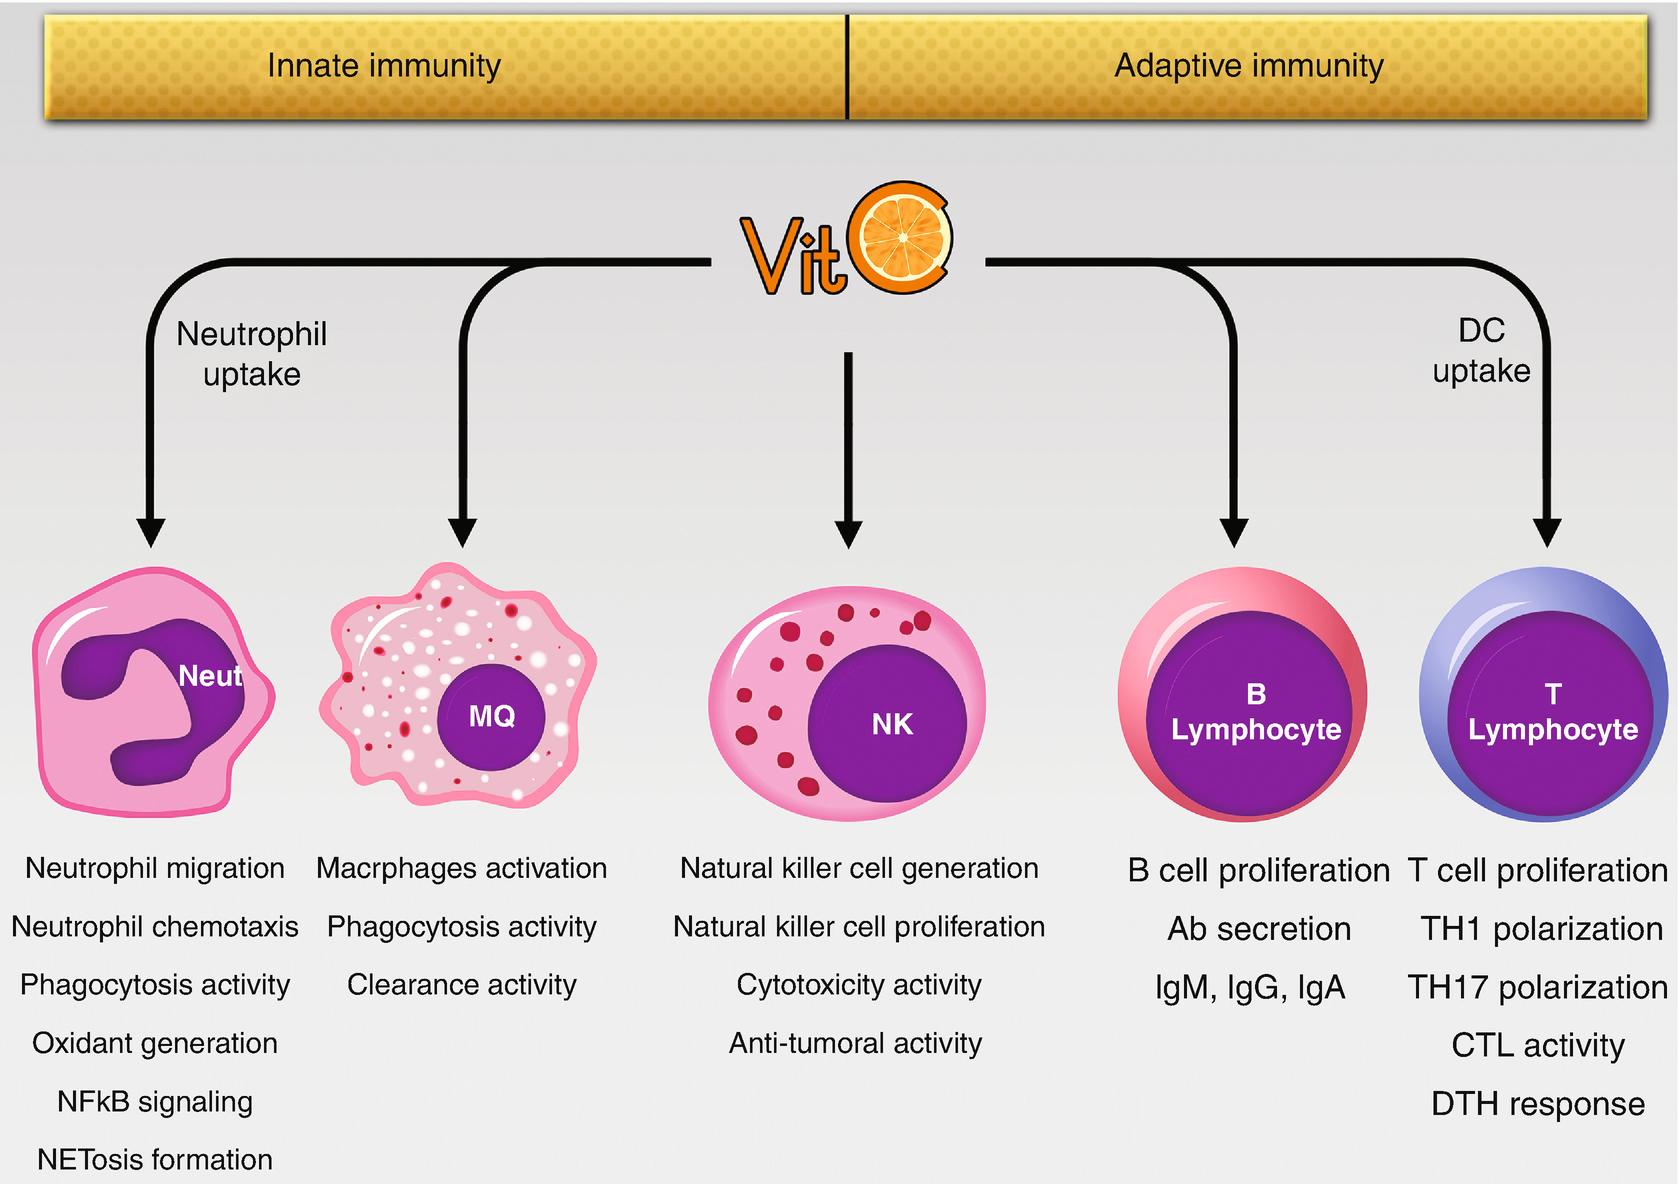 Витамин С оказывает разностороннее влияние на иммуннитет